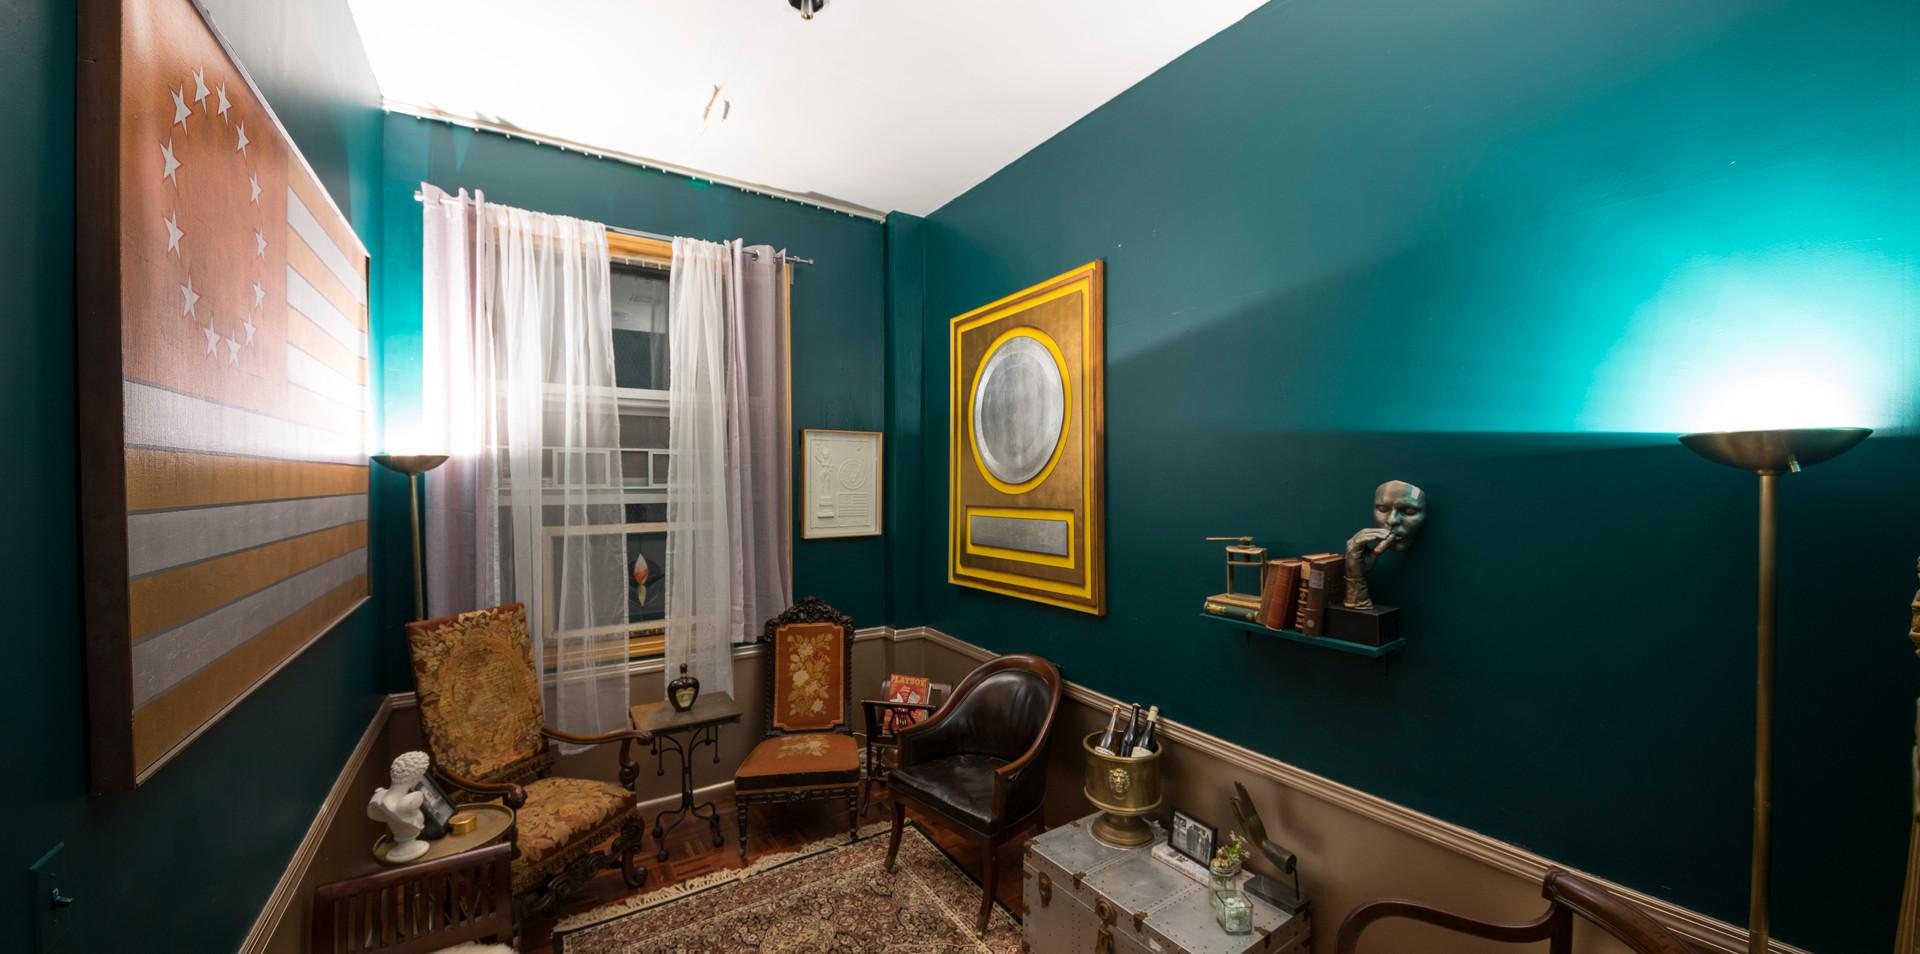 The Emerald Suite